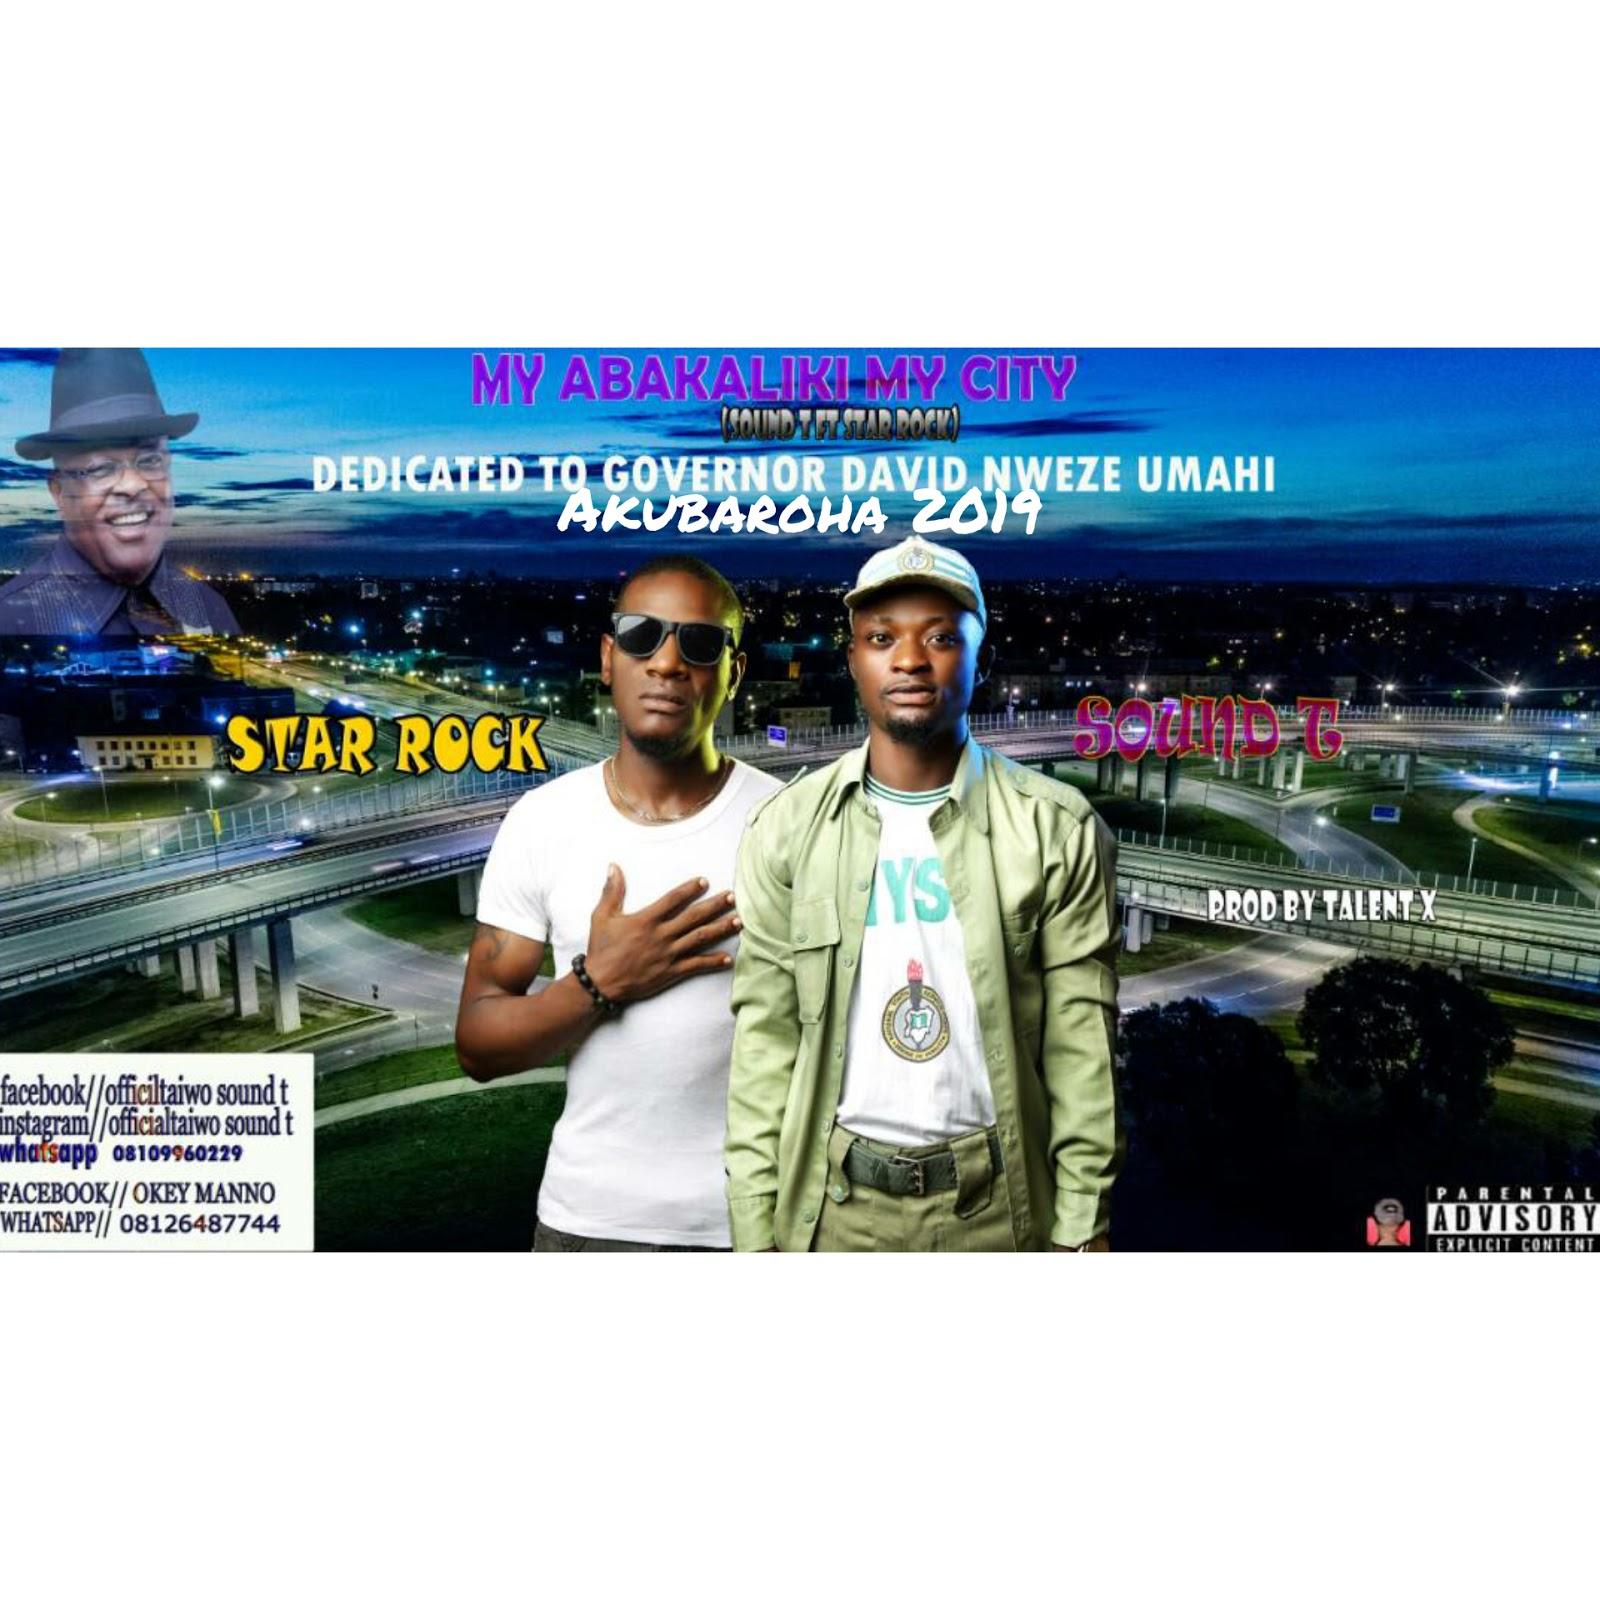 Post Malone Better Mp3 Download: Abakaliki My City.mp3